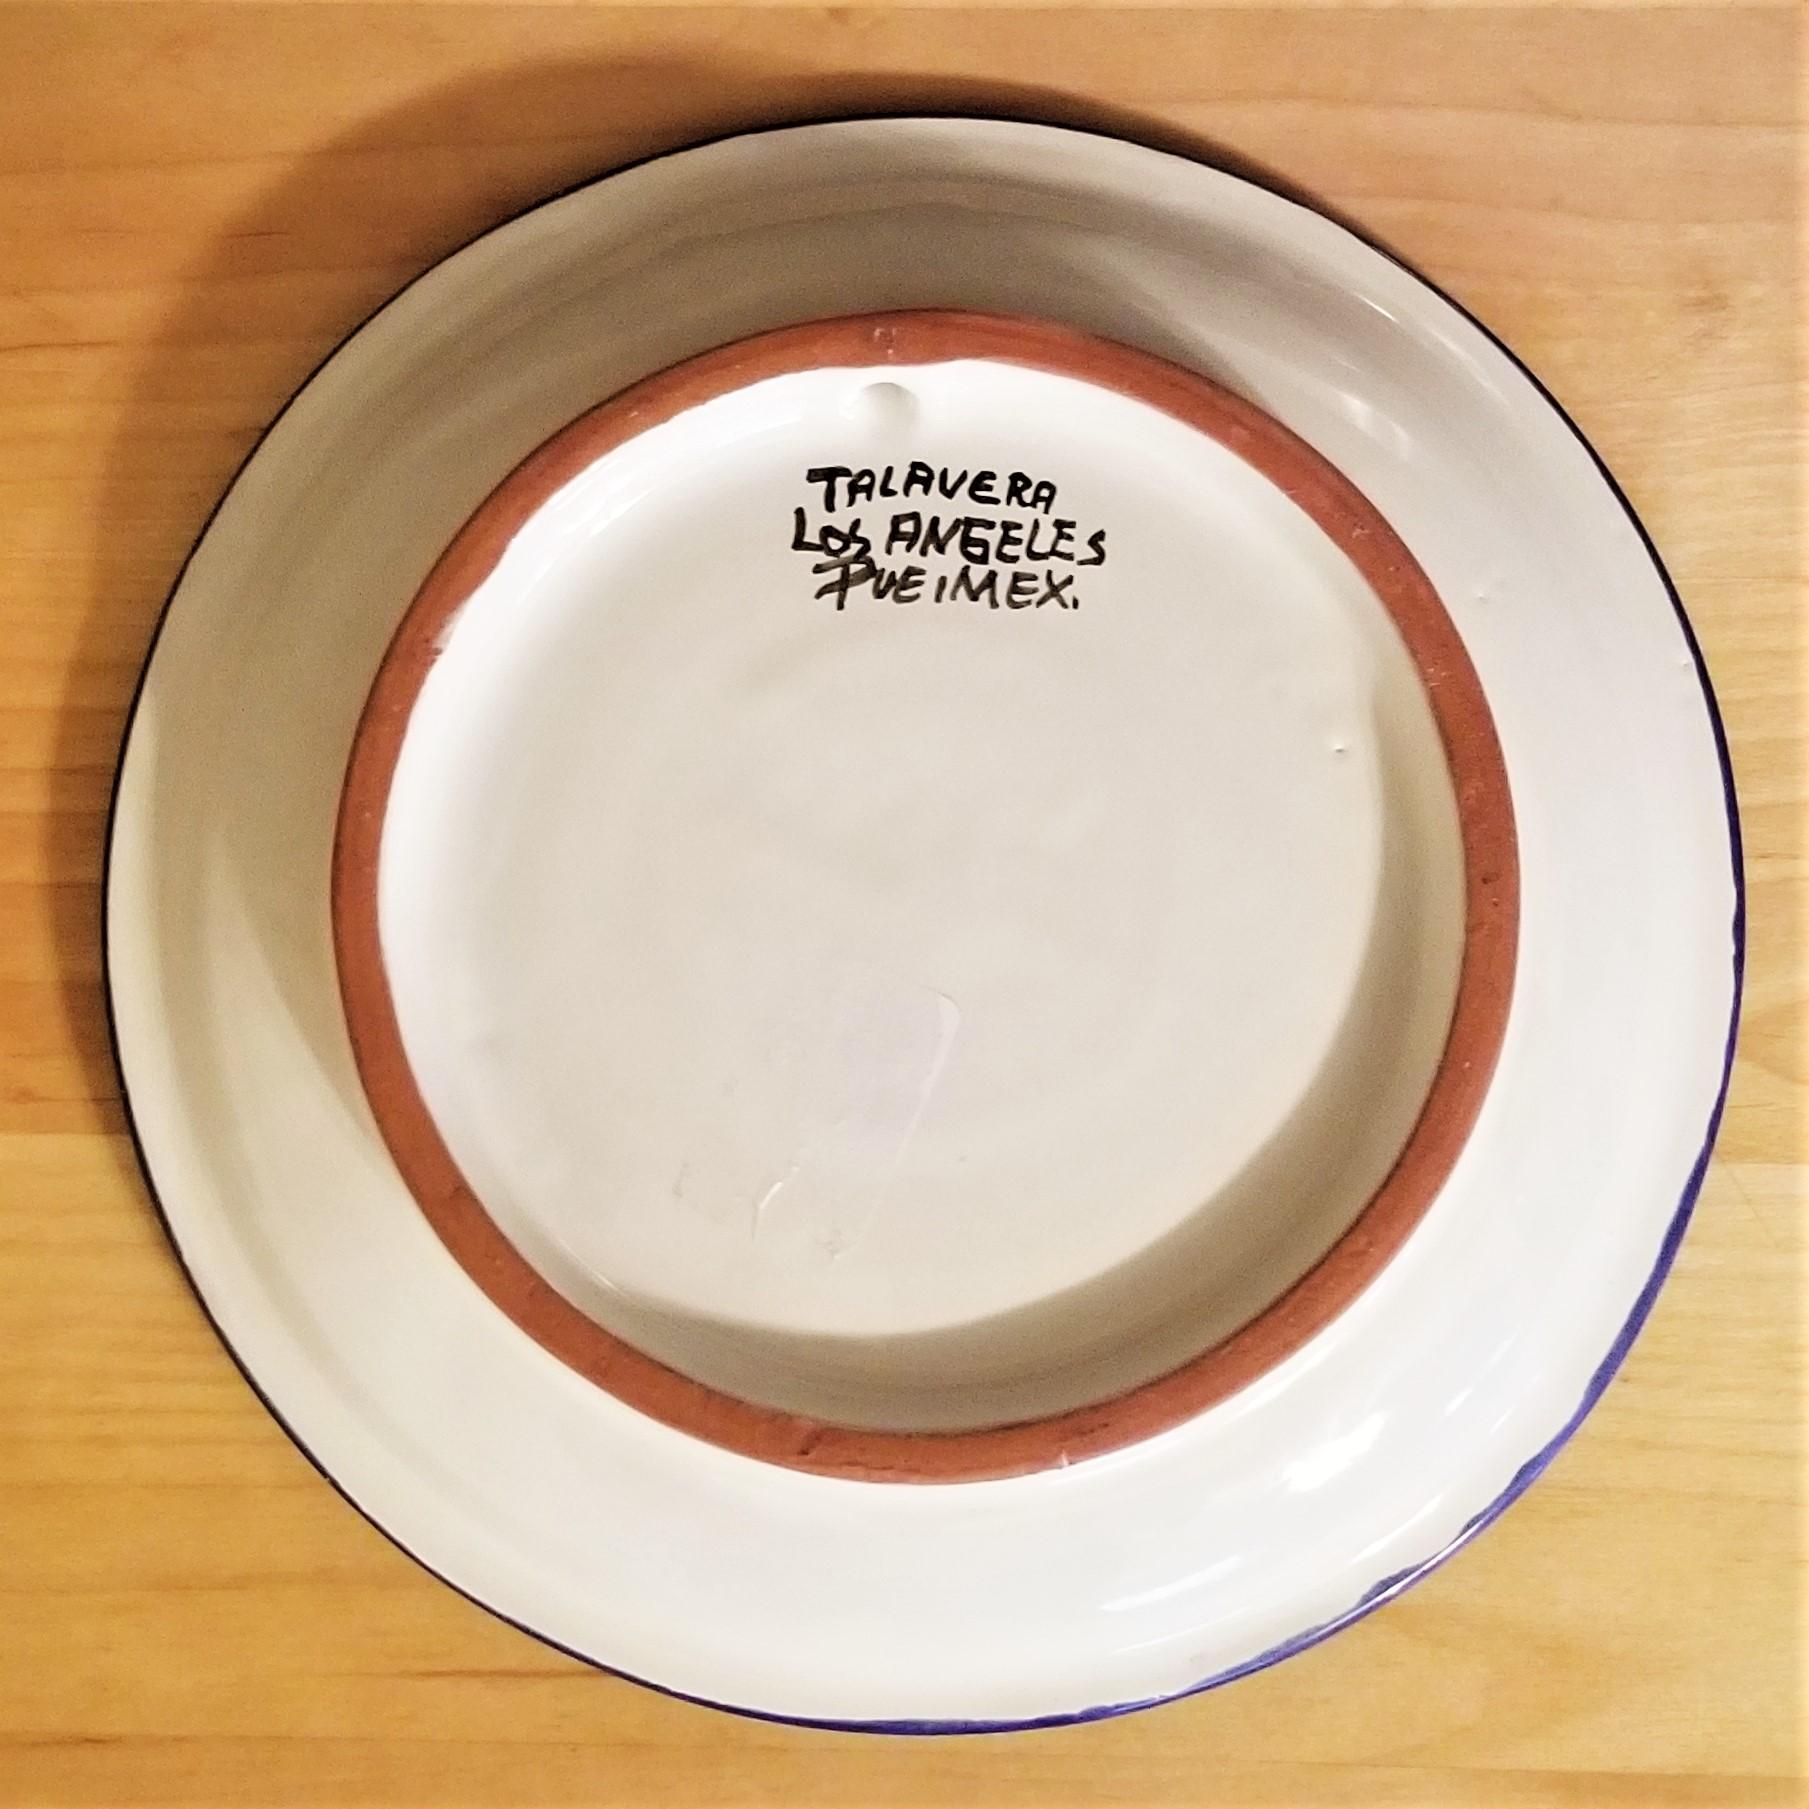 005 Talavera Blue Plate back